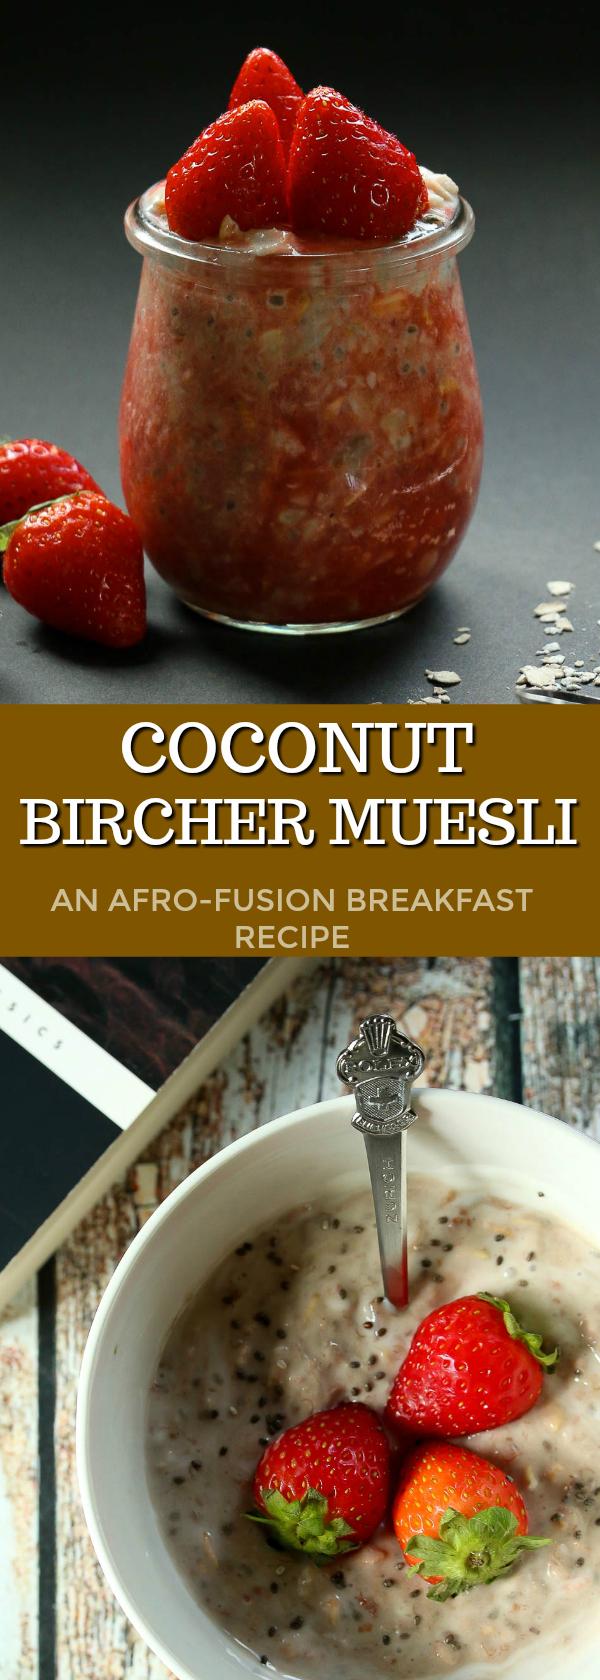 coconut-bircher-muesli-breakfast-recipe